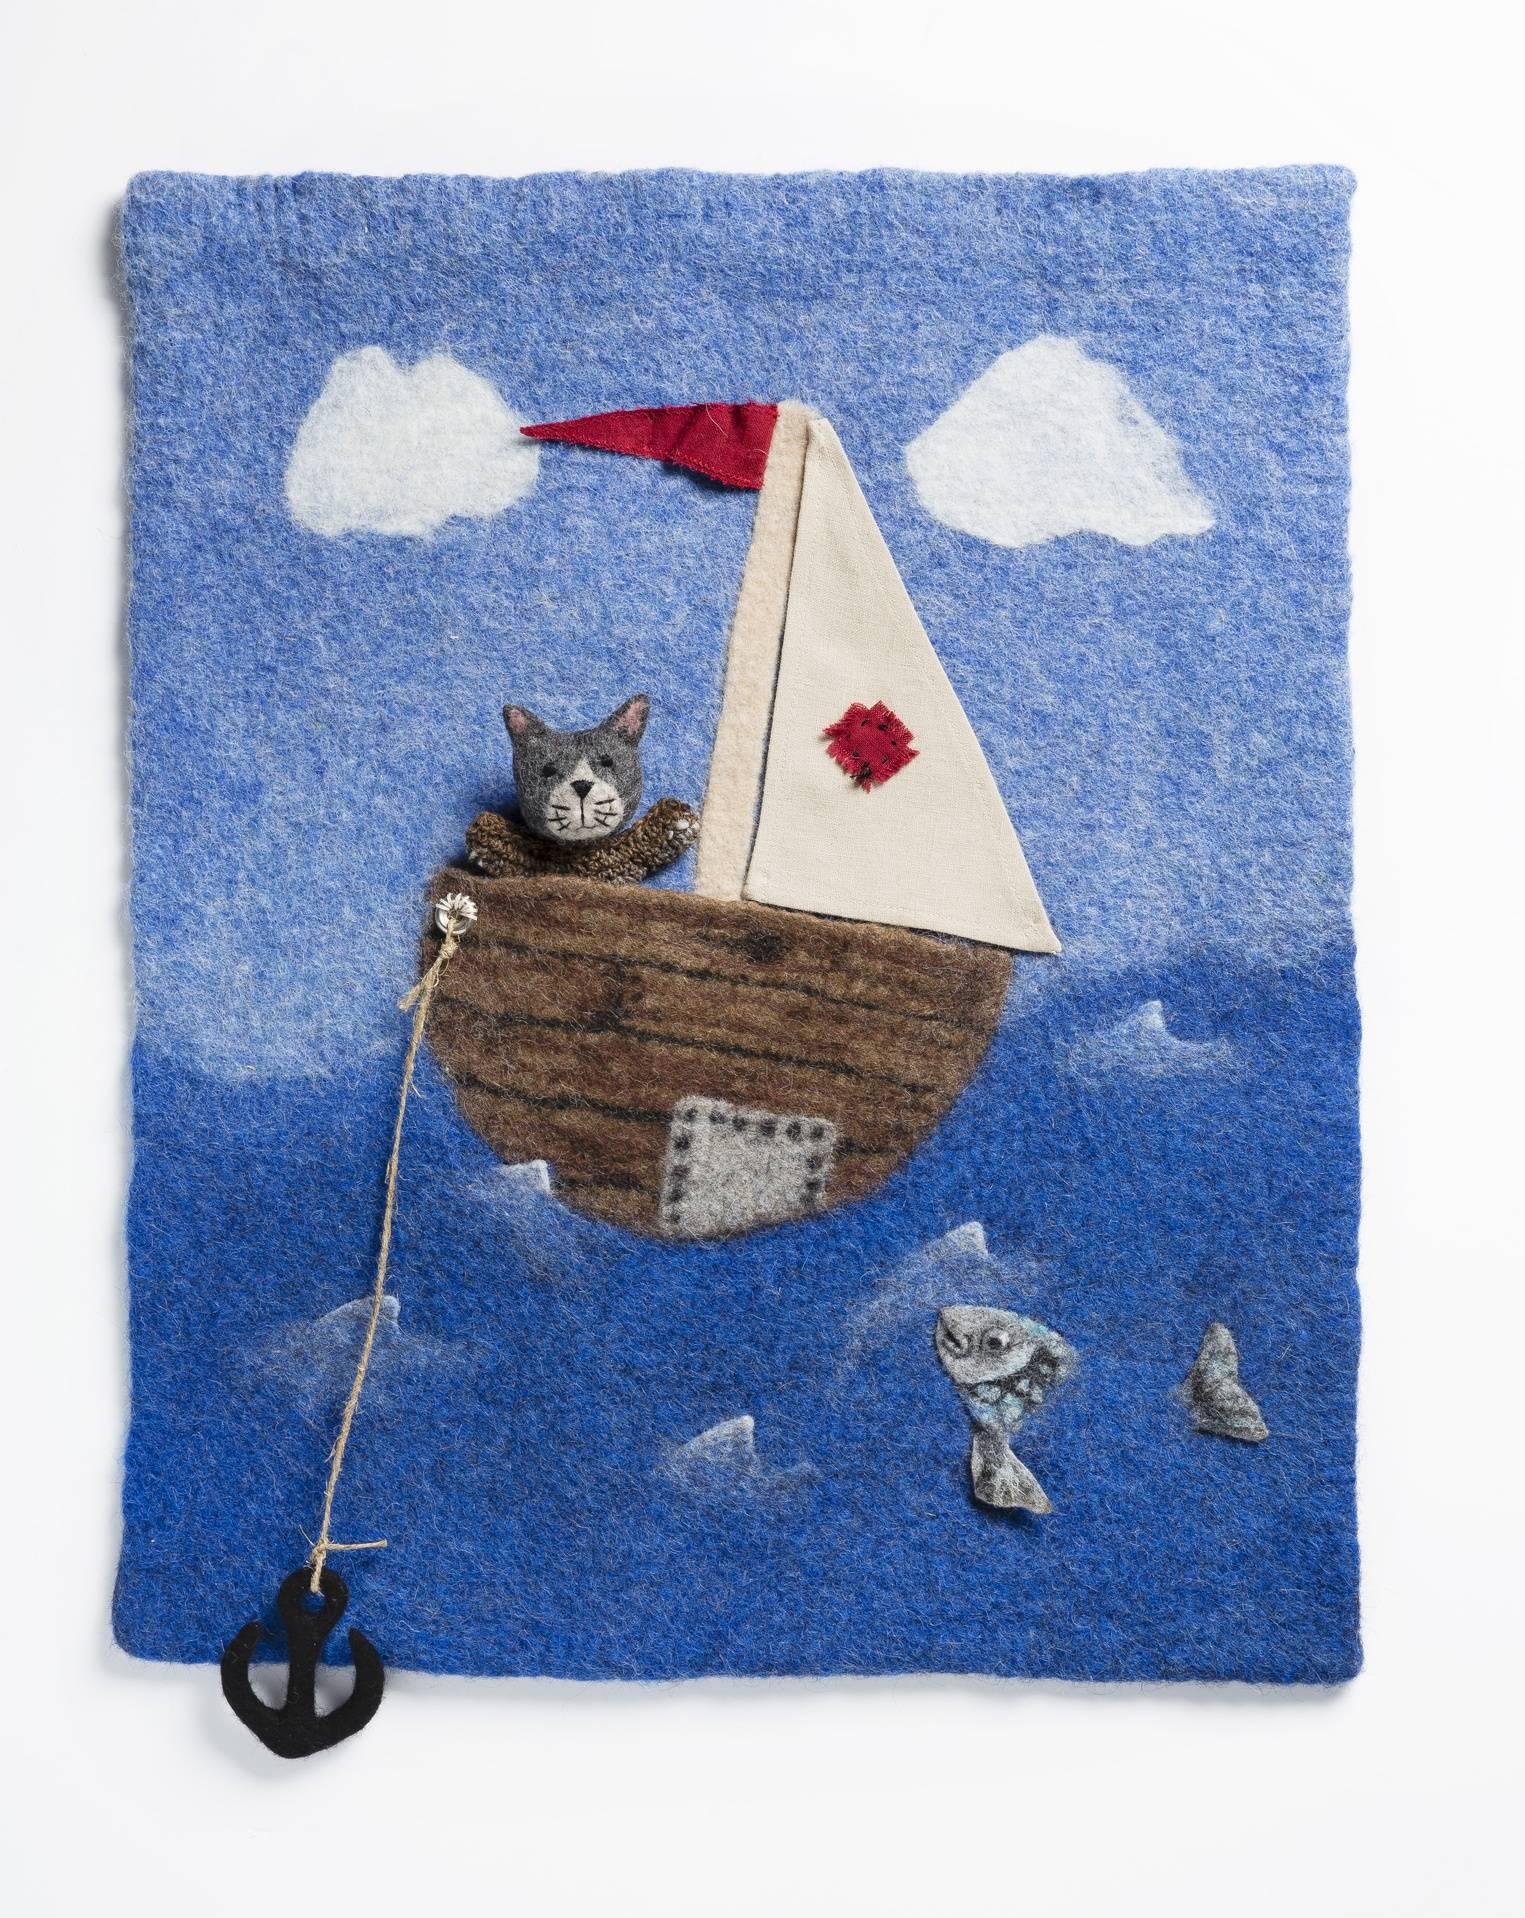 Kissa matkalla, Cat in a boat